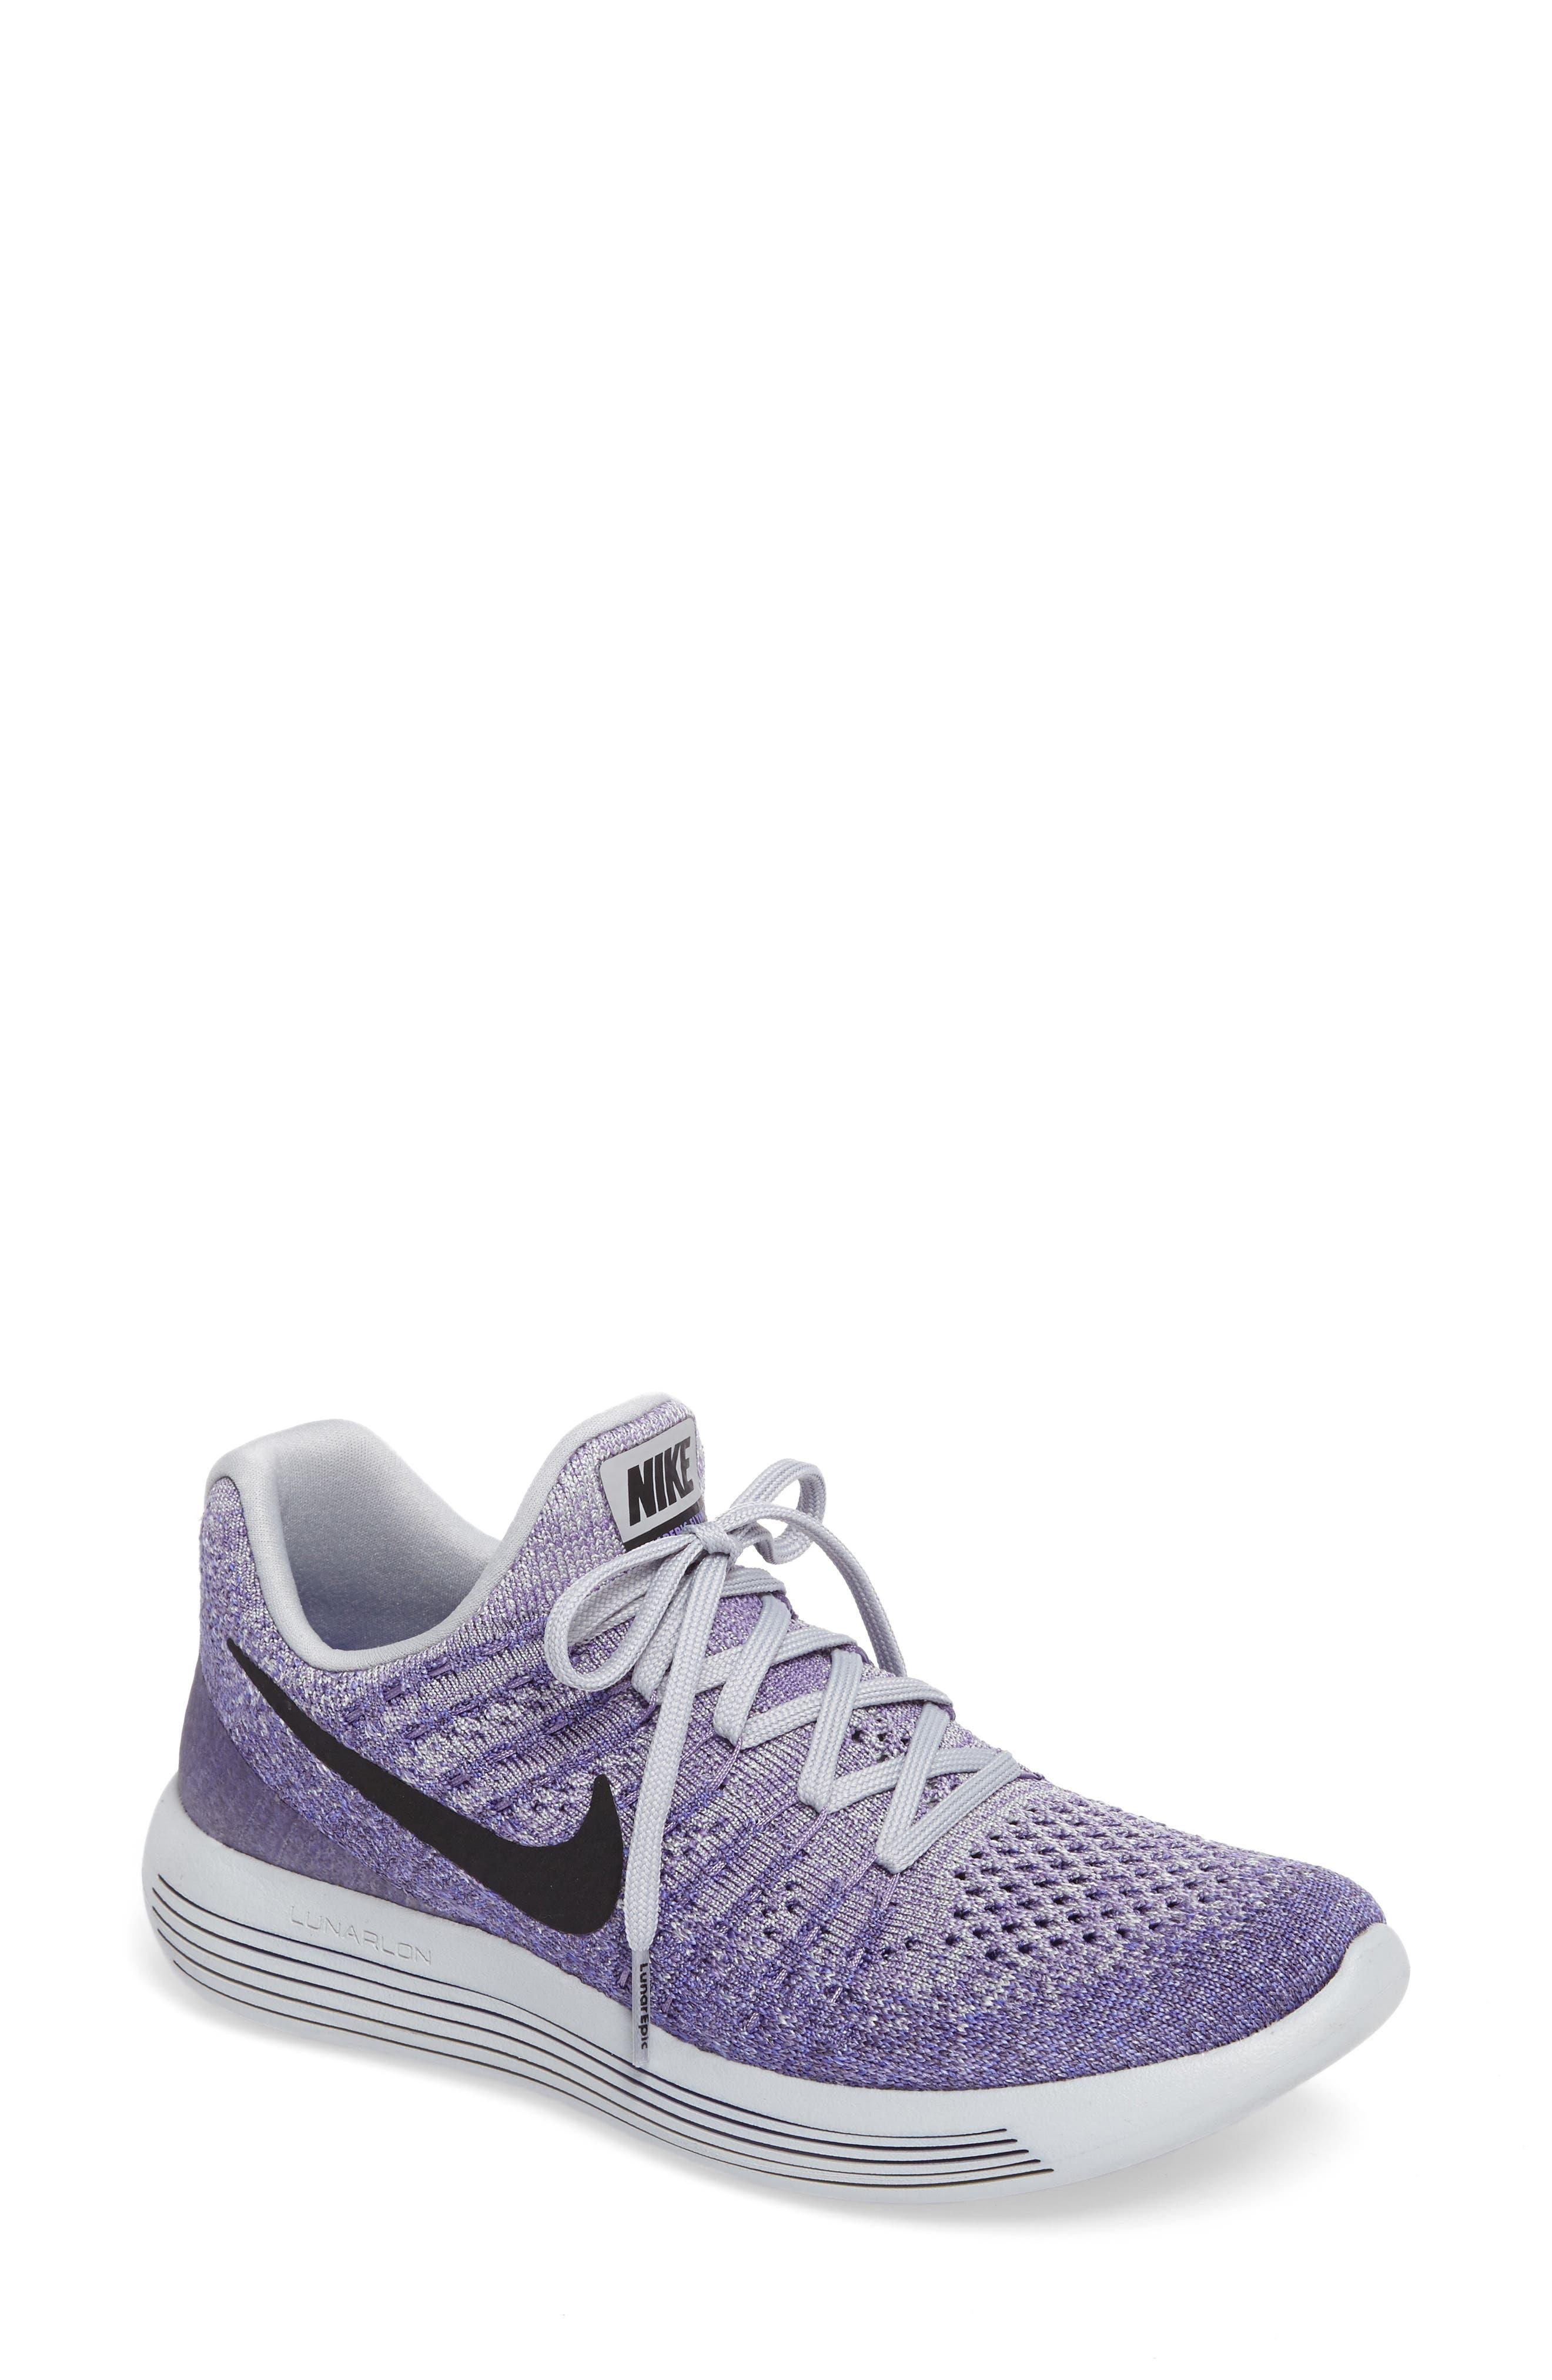 Alternate Image 1 Selected - Nike LunarEpic Low Flyknit 2 Running Shoe (Women)